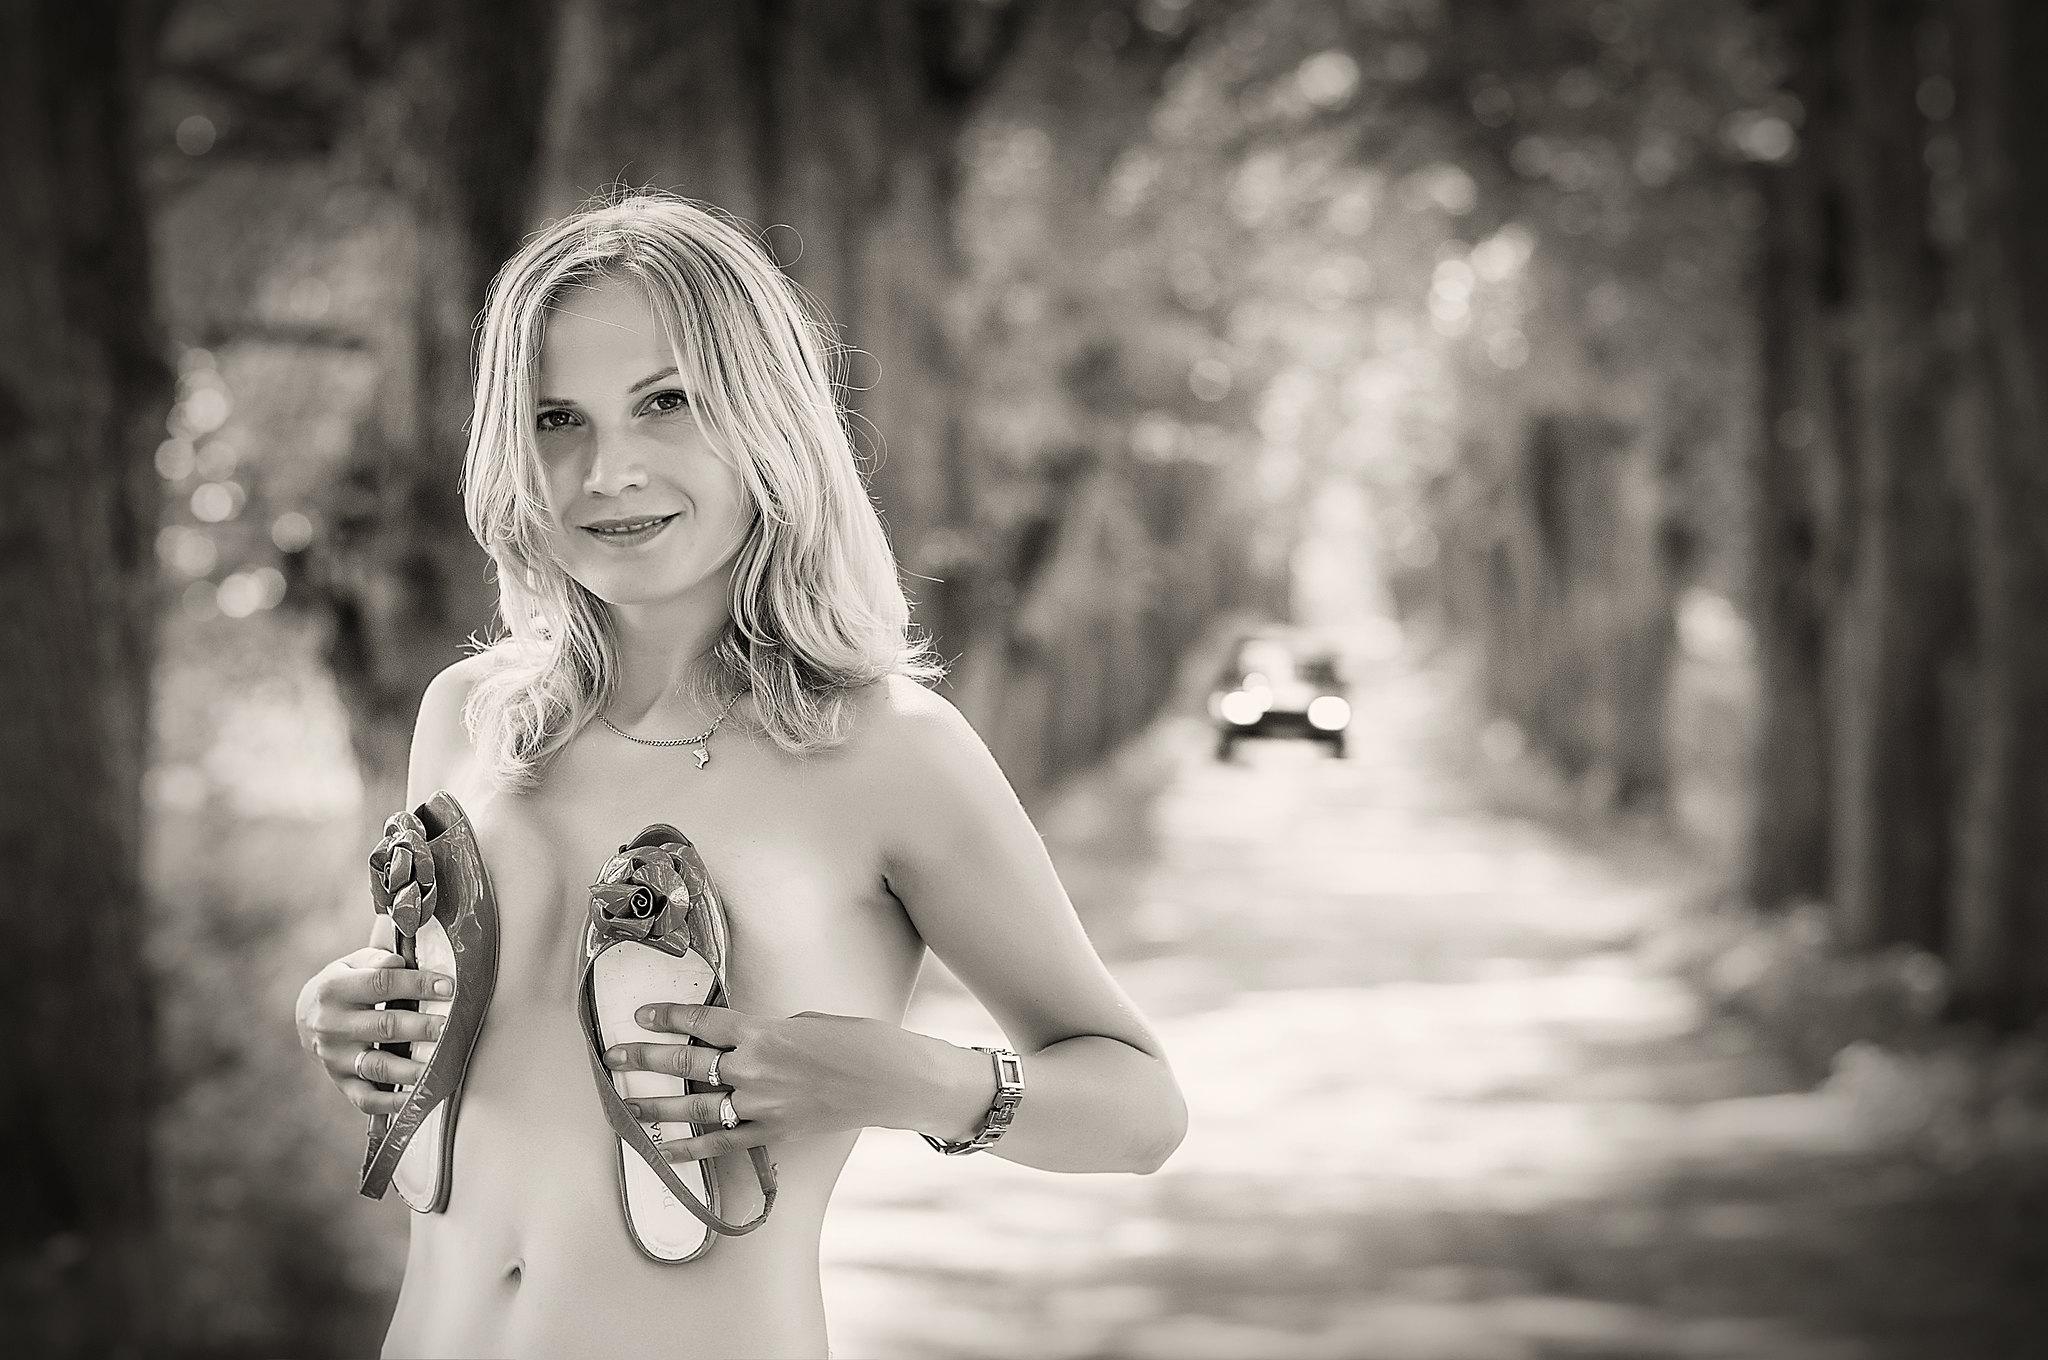 Model: Oksana